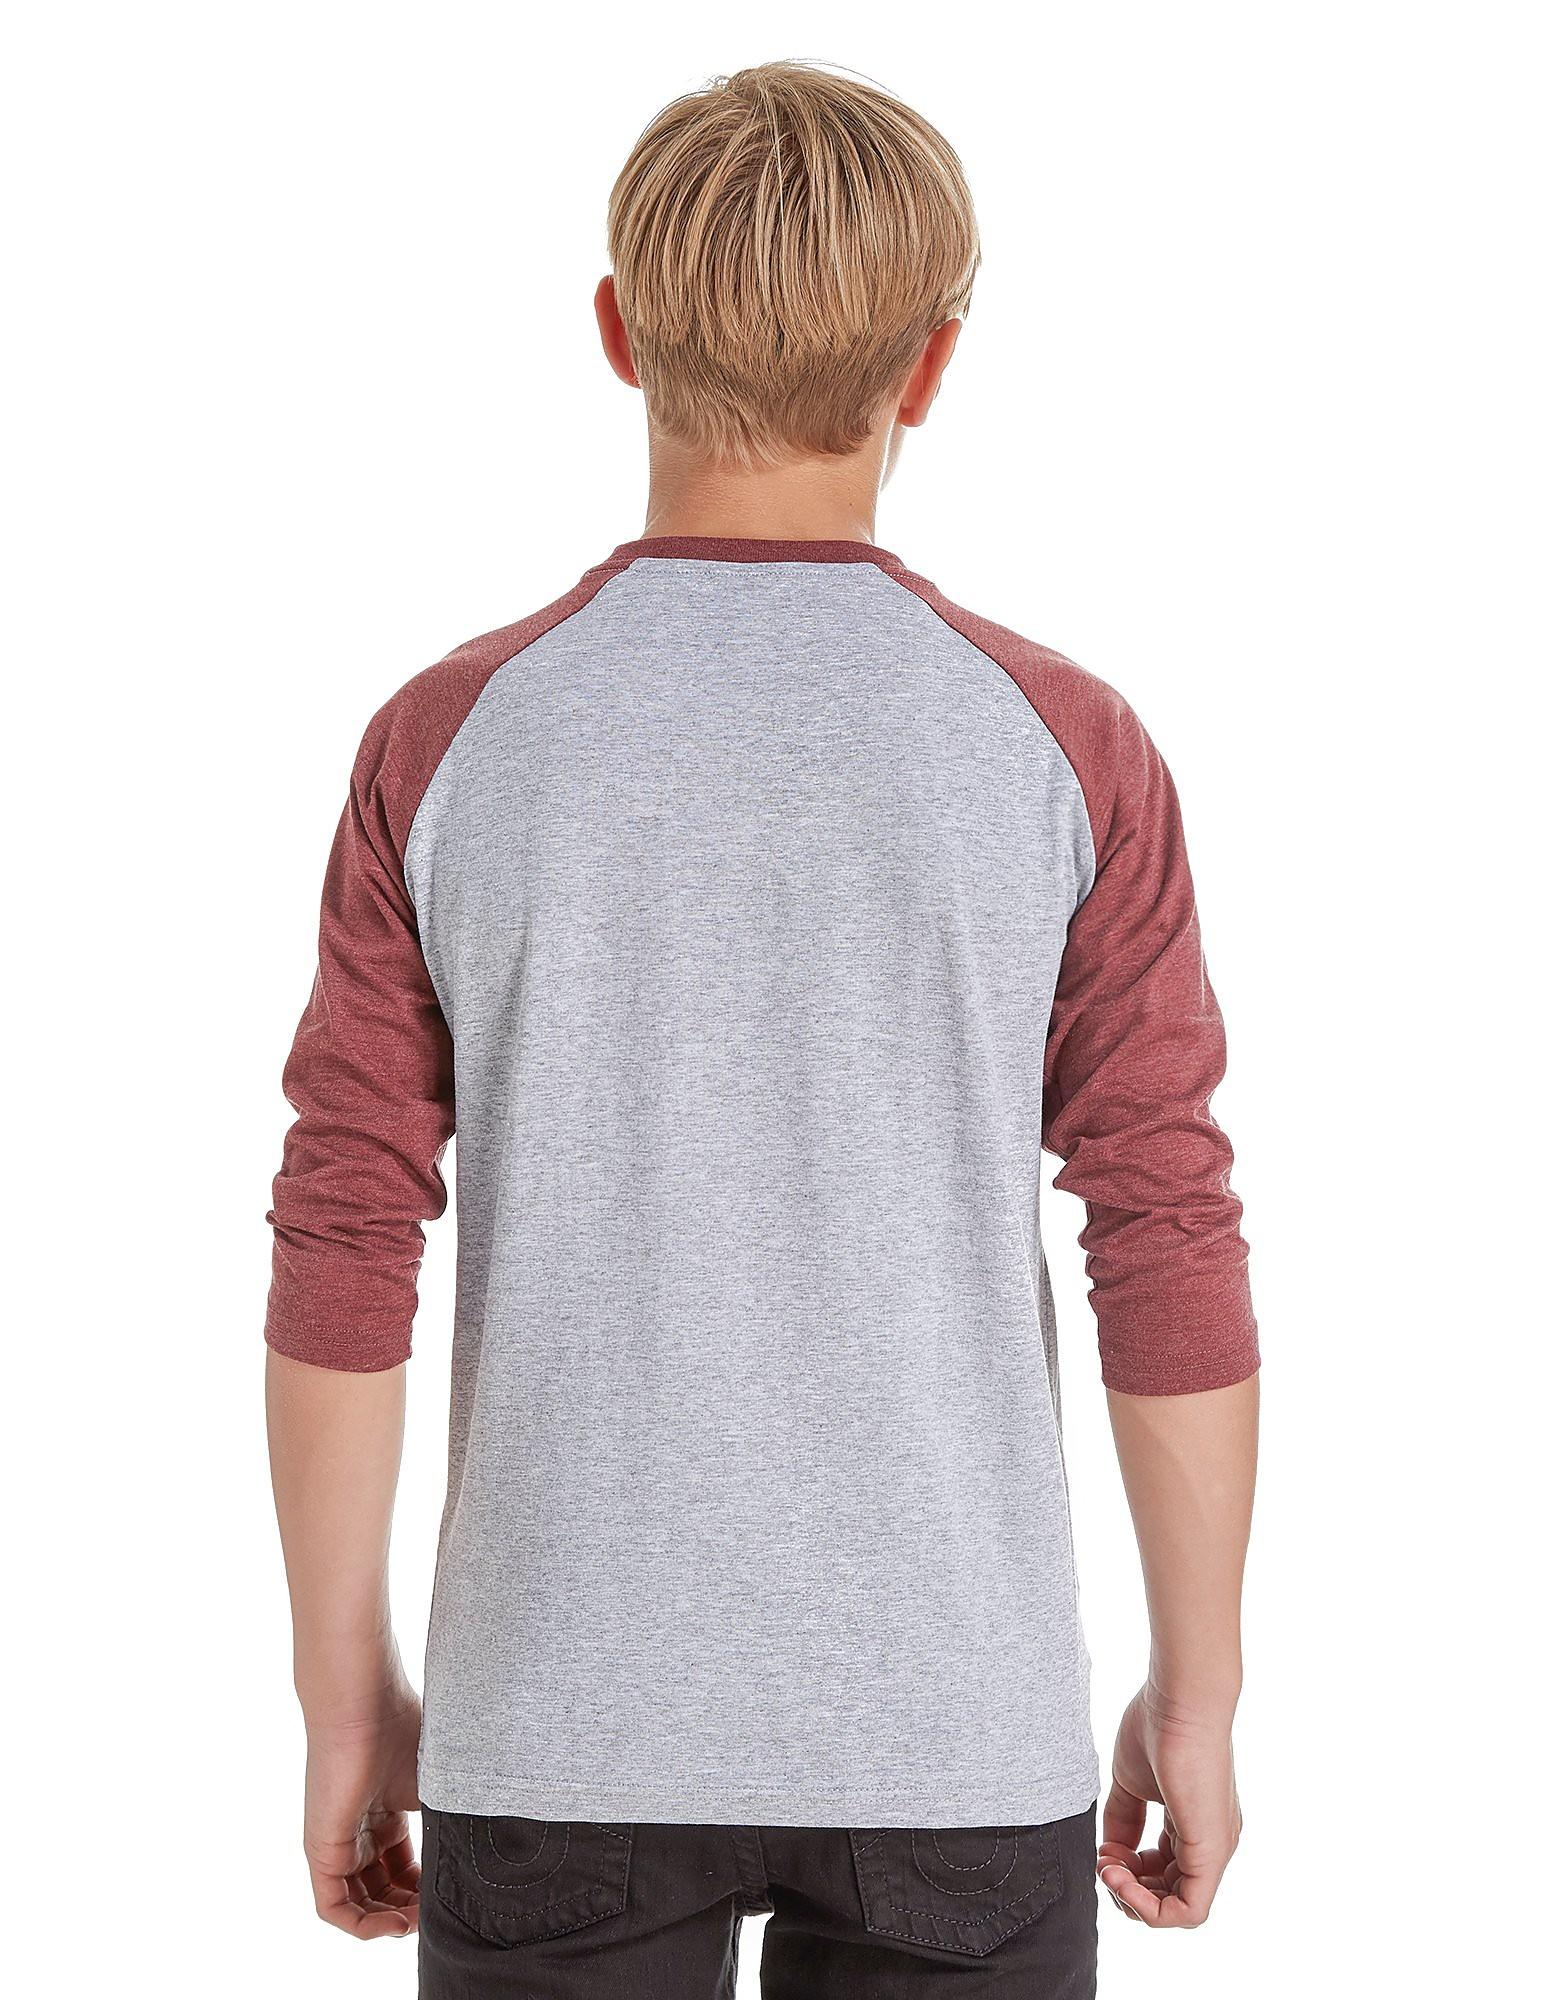 Vans camiseta Classic Raglan Sleeve júnior